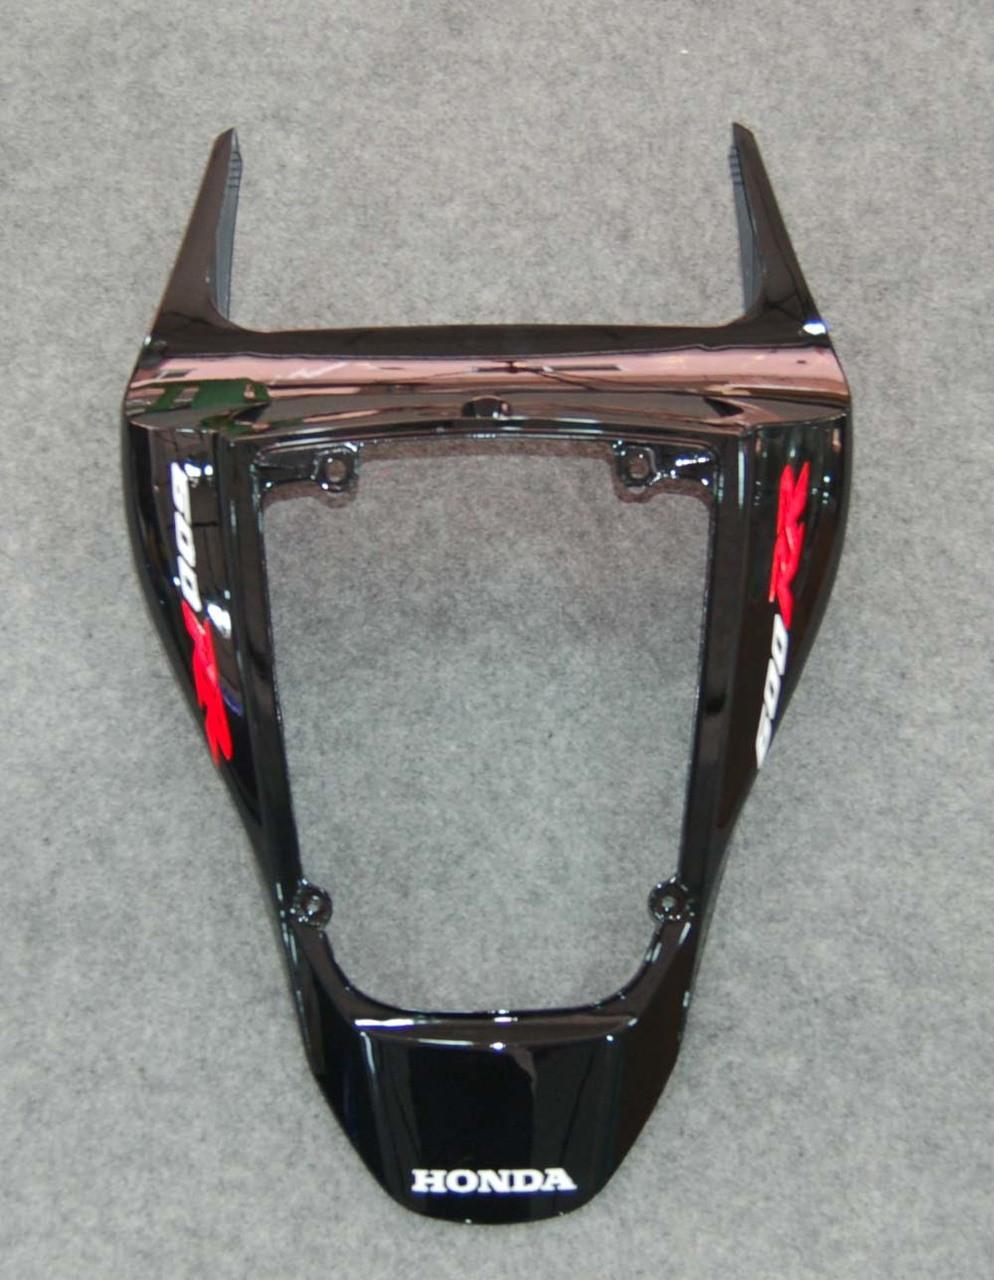 Fairings Honda CBR 600 RR Multi-Color San Carlo Racing (2007-2008)